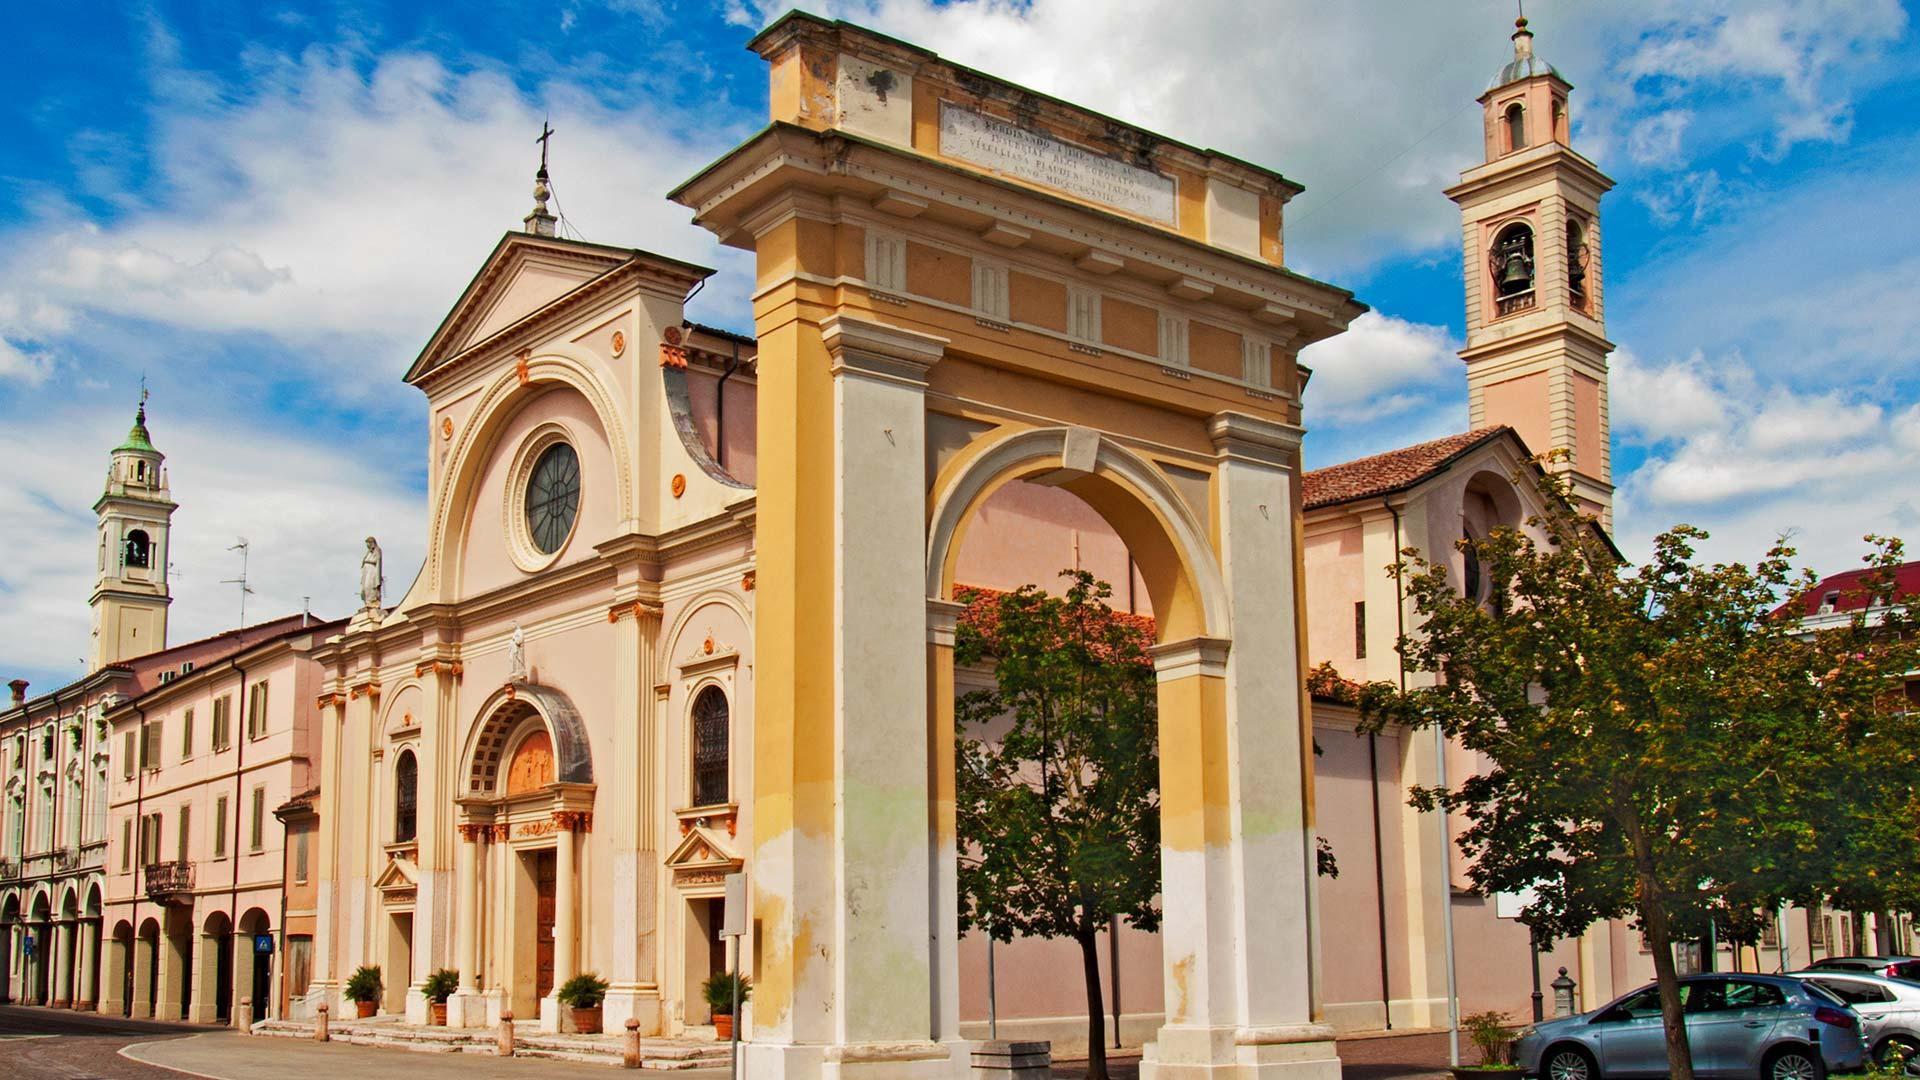 Proloco Viadana - Viadana Chiesa Santa Maria Assunta in Castello